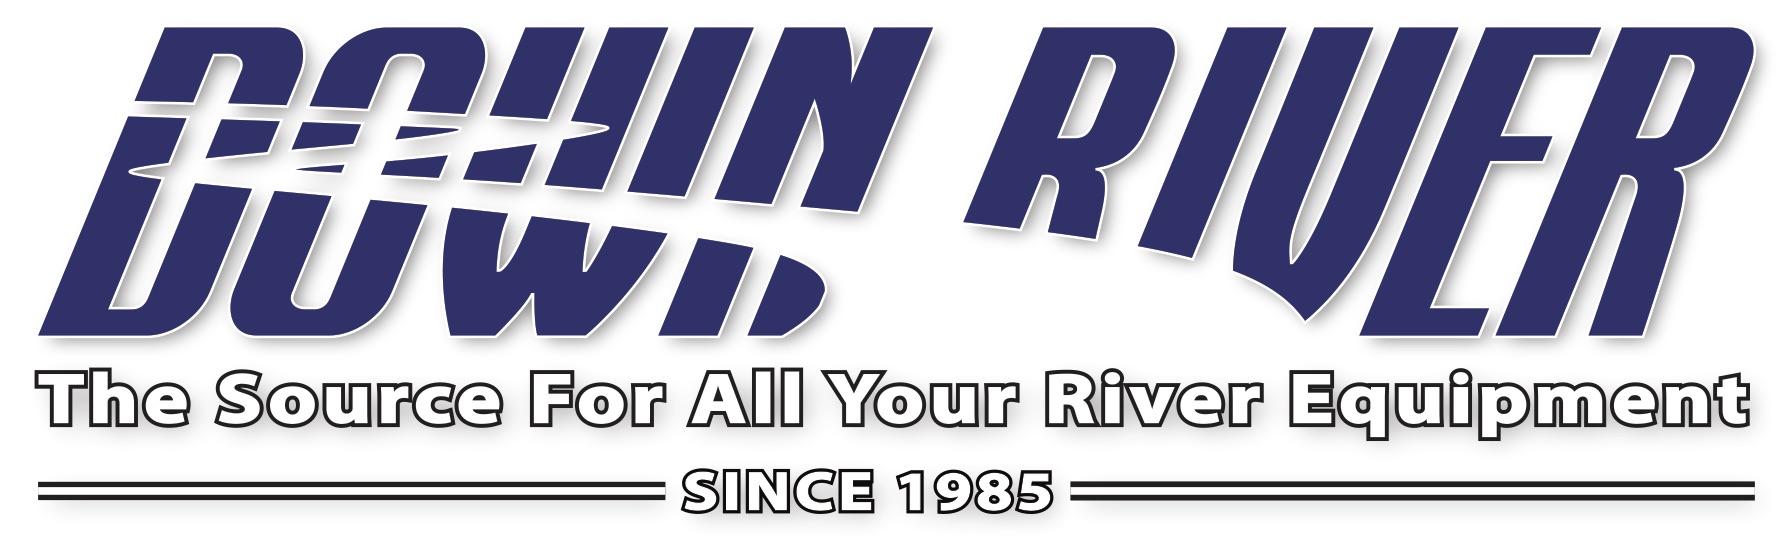 Down River Blue Logo-Tagline and Date.jpg